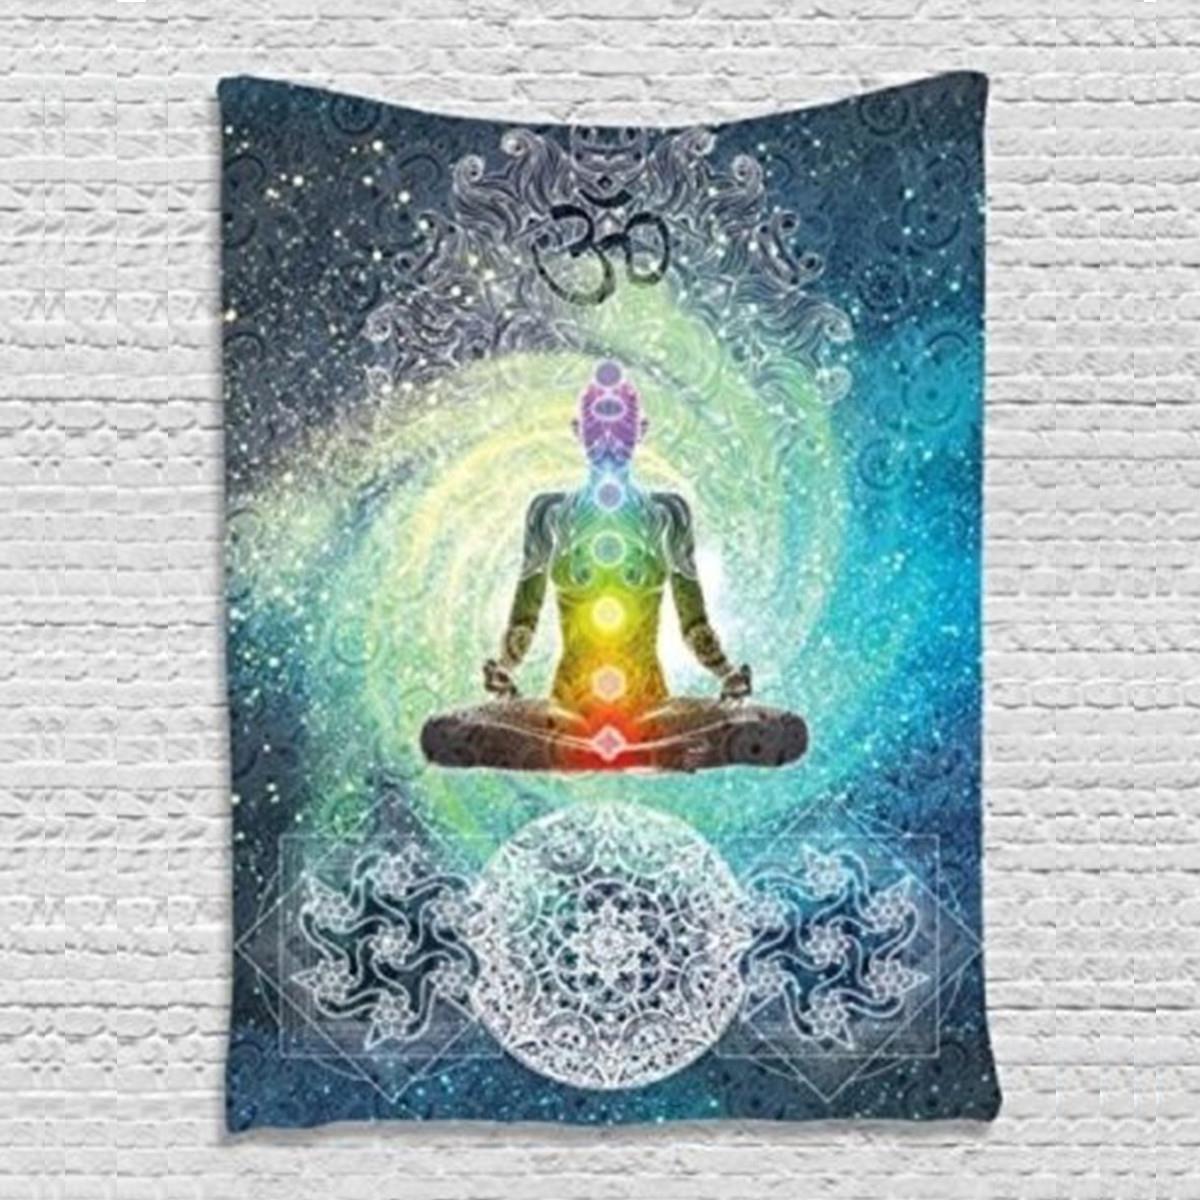 Wandbehang Indische Mandala Tapisserie 200X130 cm Böhmische Tagesdecke Wohnheim Abdeckung Yoga Matte Strandtuch Home Room Wall Art Decor